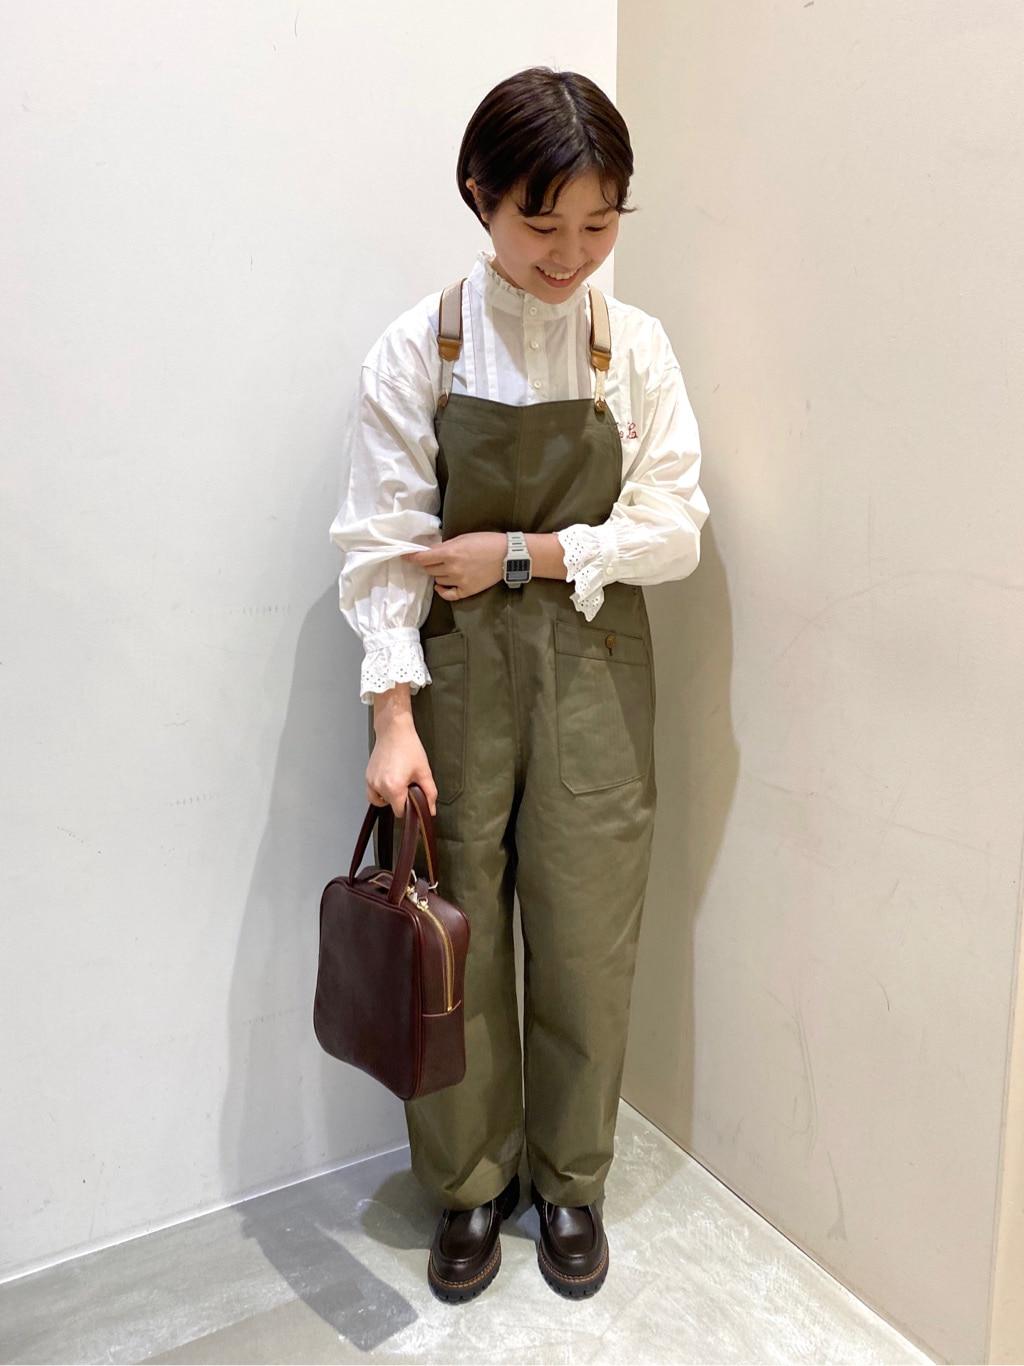 bulle de savon 阪急西宮ガーデンズ 身長:149cm 2021.04.05